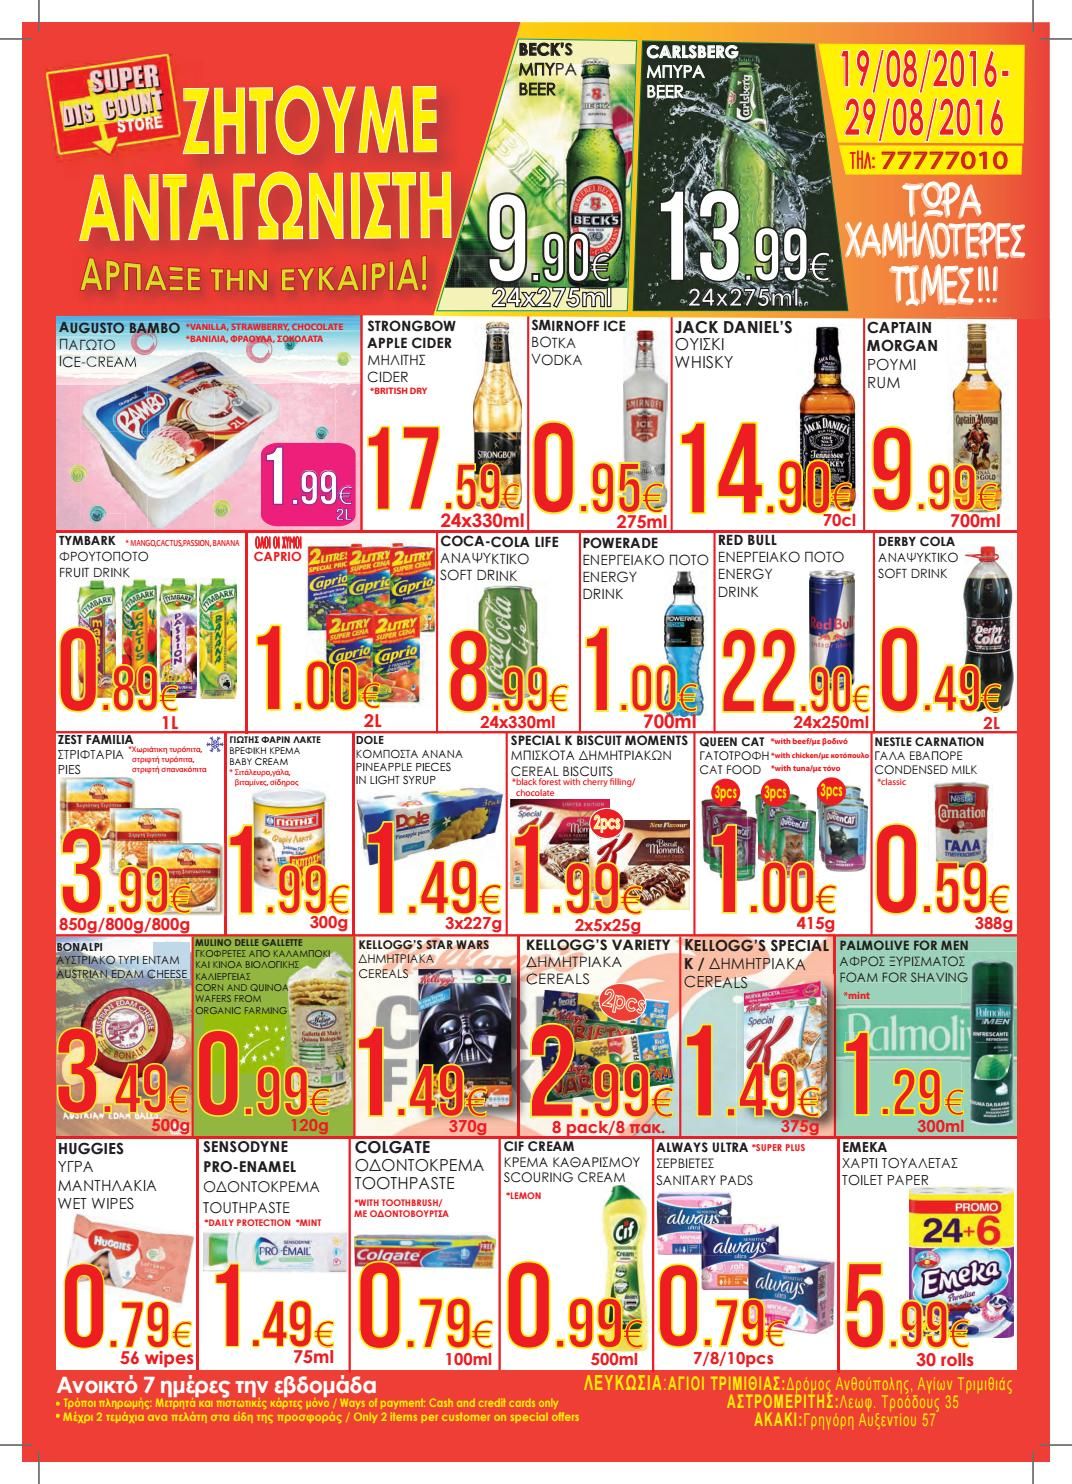 Super Discound Store Nic 1908 2908 2016 By Offerscy Issuu Dettol Profresh 120g